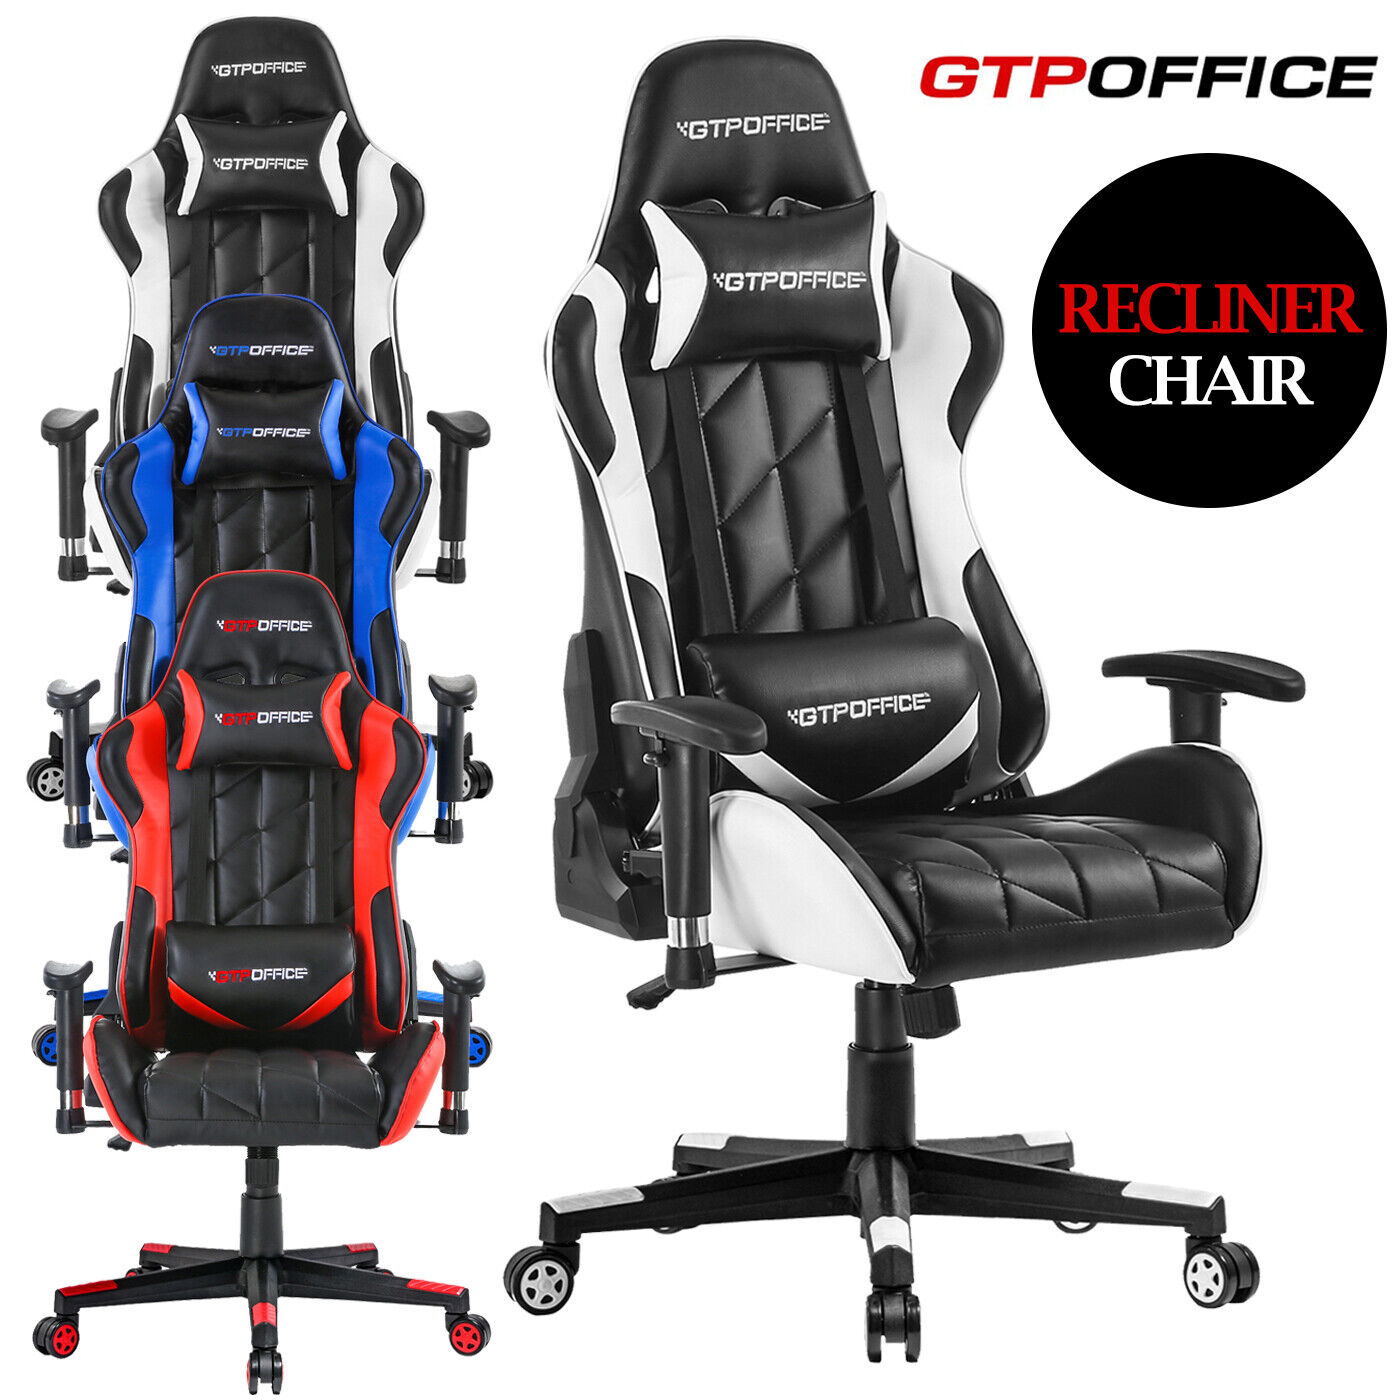 High-Back Swivel Gaming Chair Ergonomic Office Chair W/ Lumb